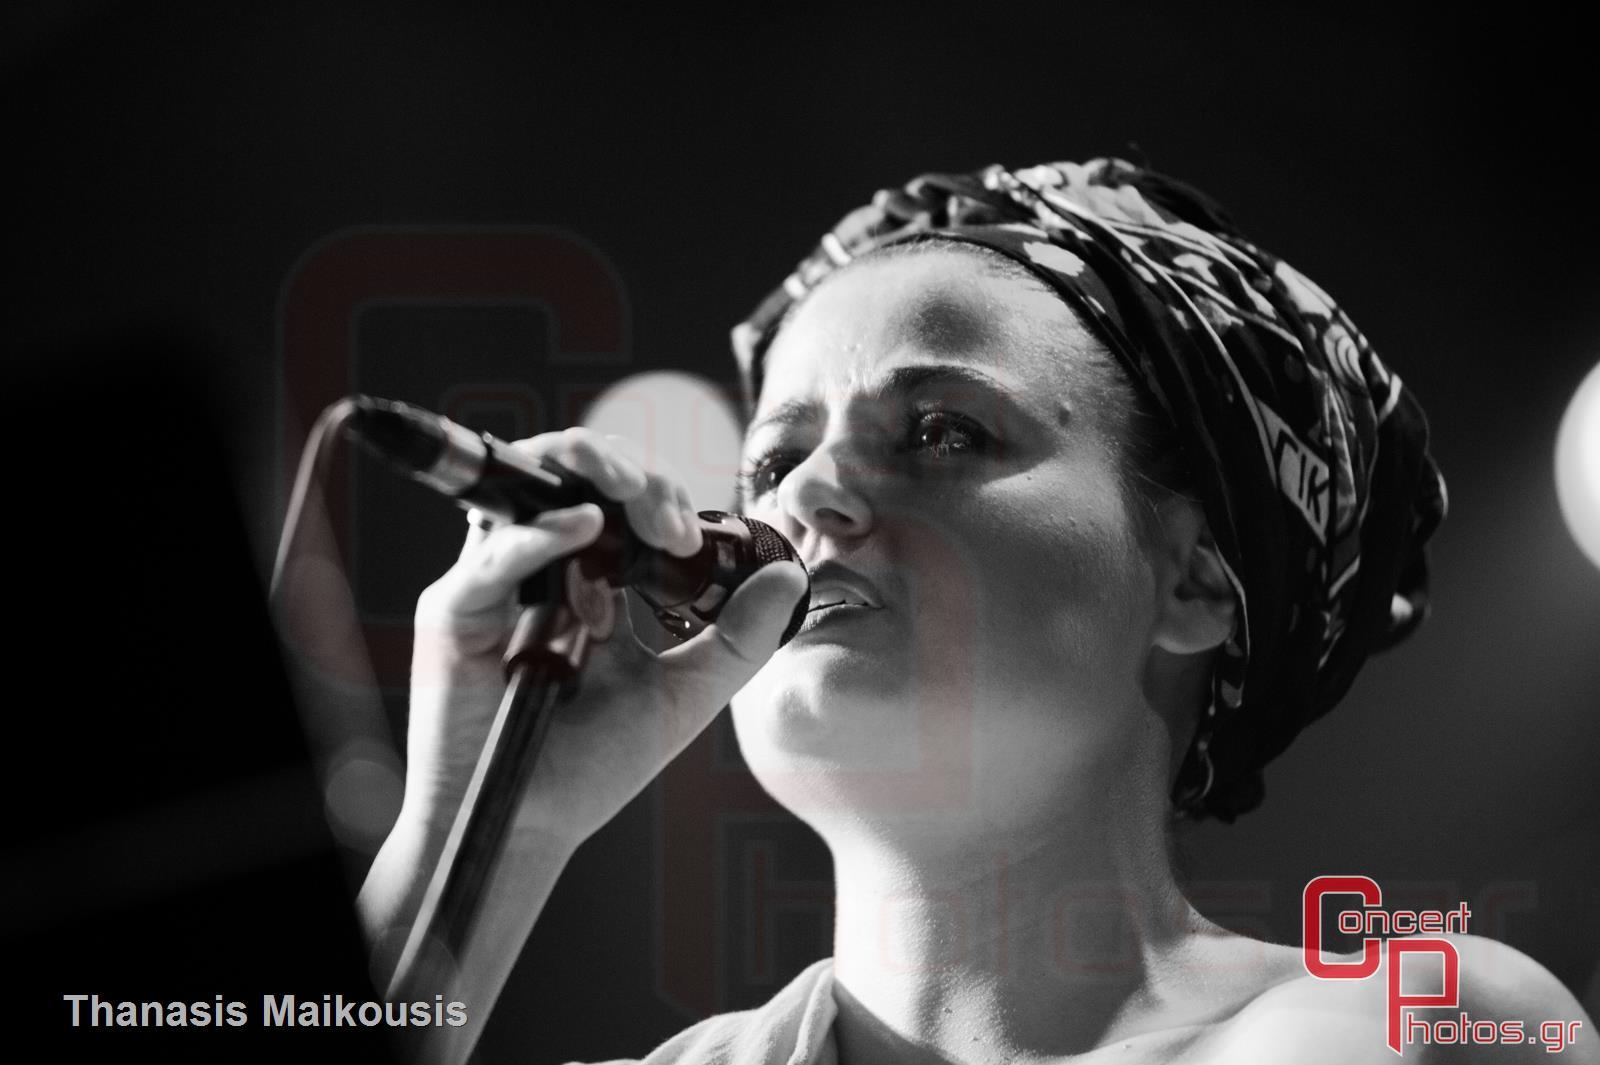 Active Member - Τραγούδα μας να φύγει το σκοτάδι- photographer: Thanasis Maikousis - concertphotos_-4858